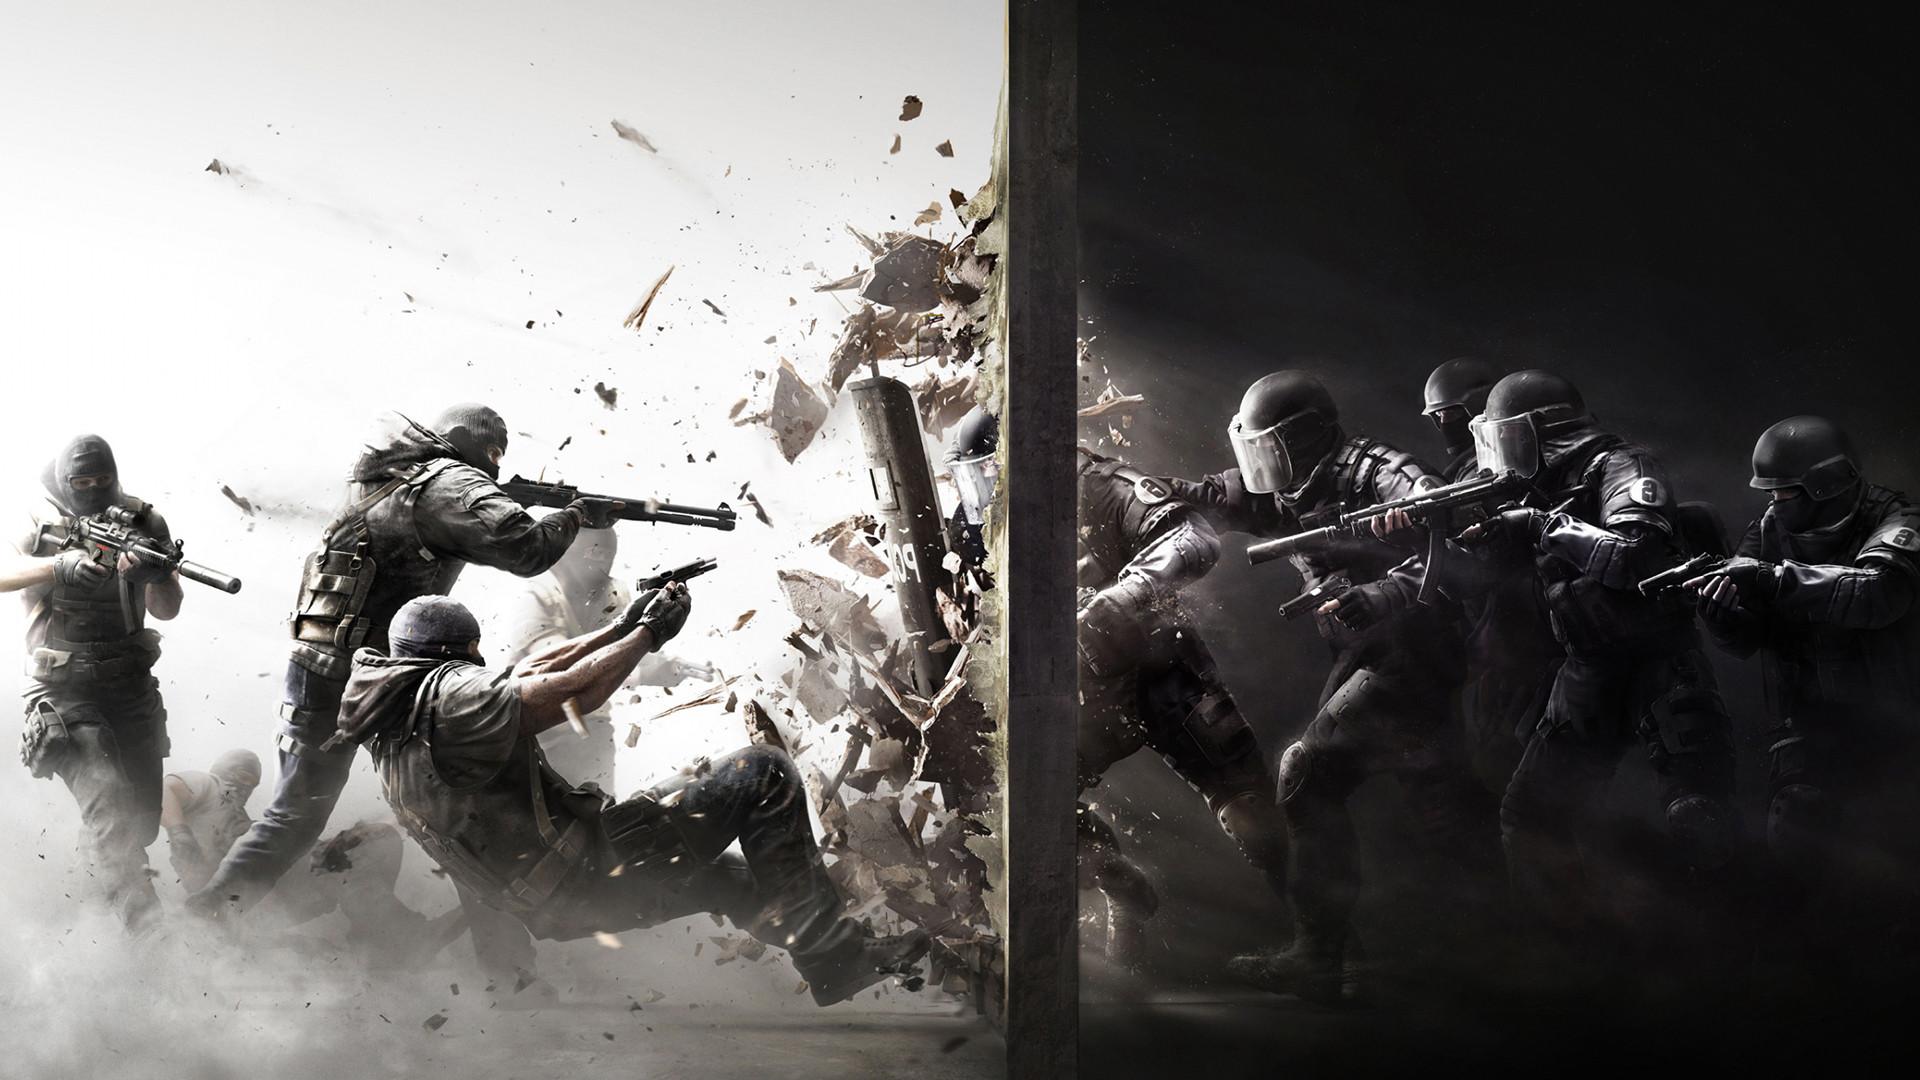 Wallpaper Police Gun Video Games Rainbow Six Siege